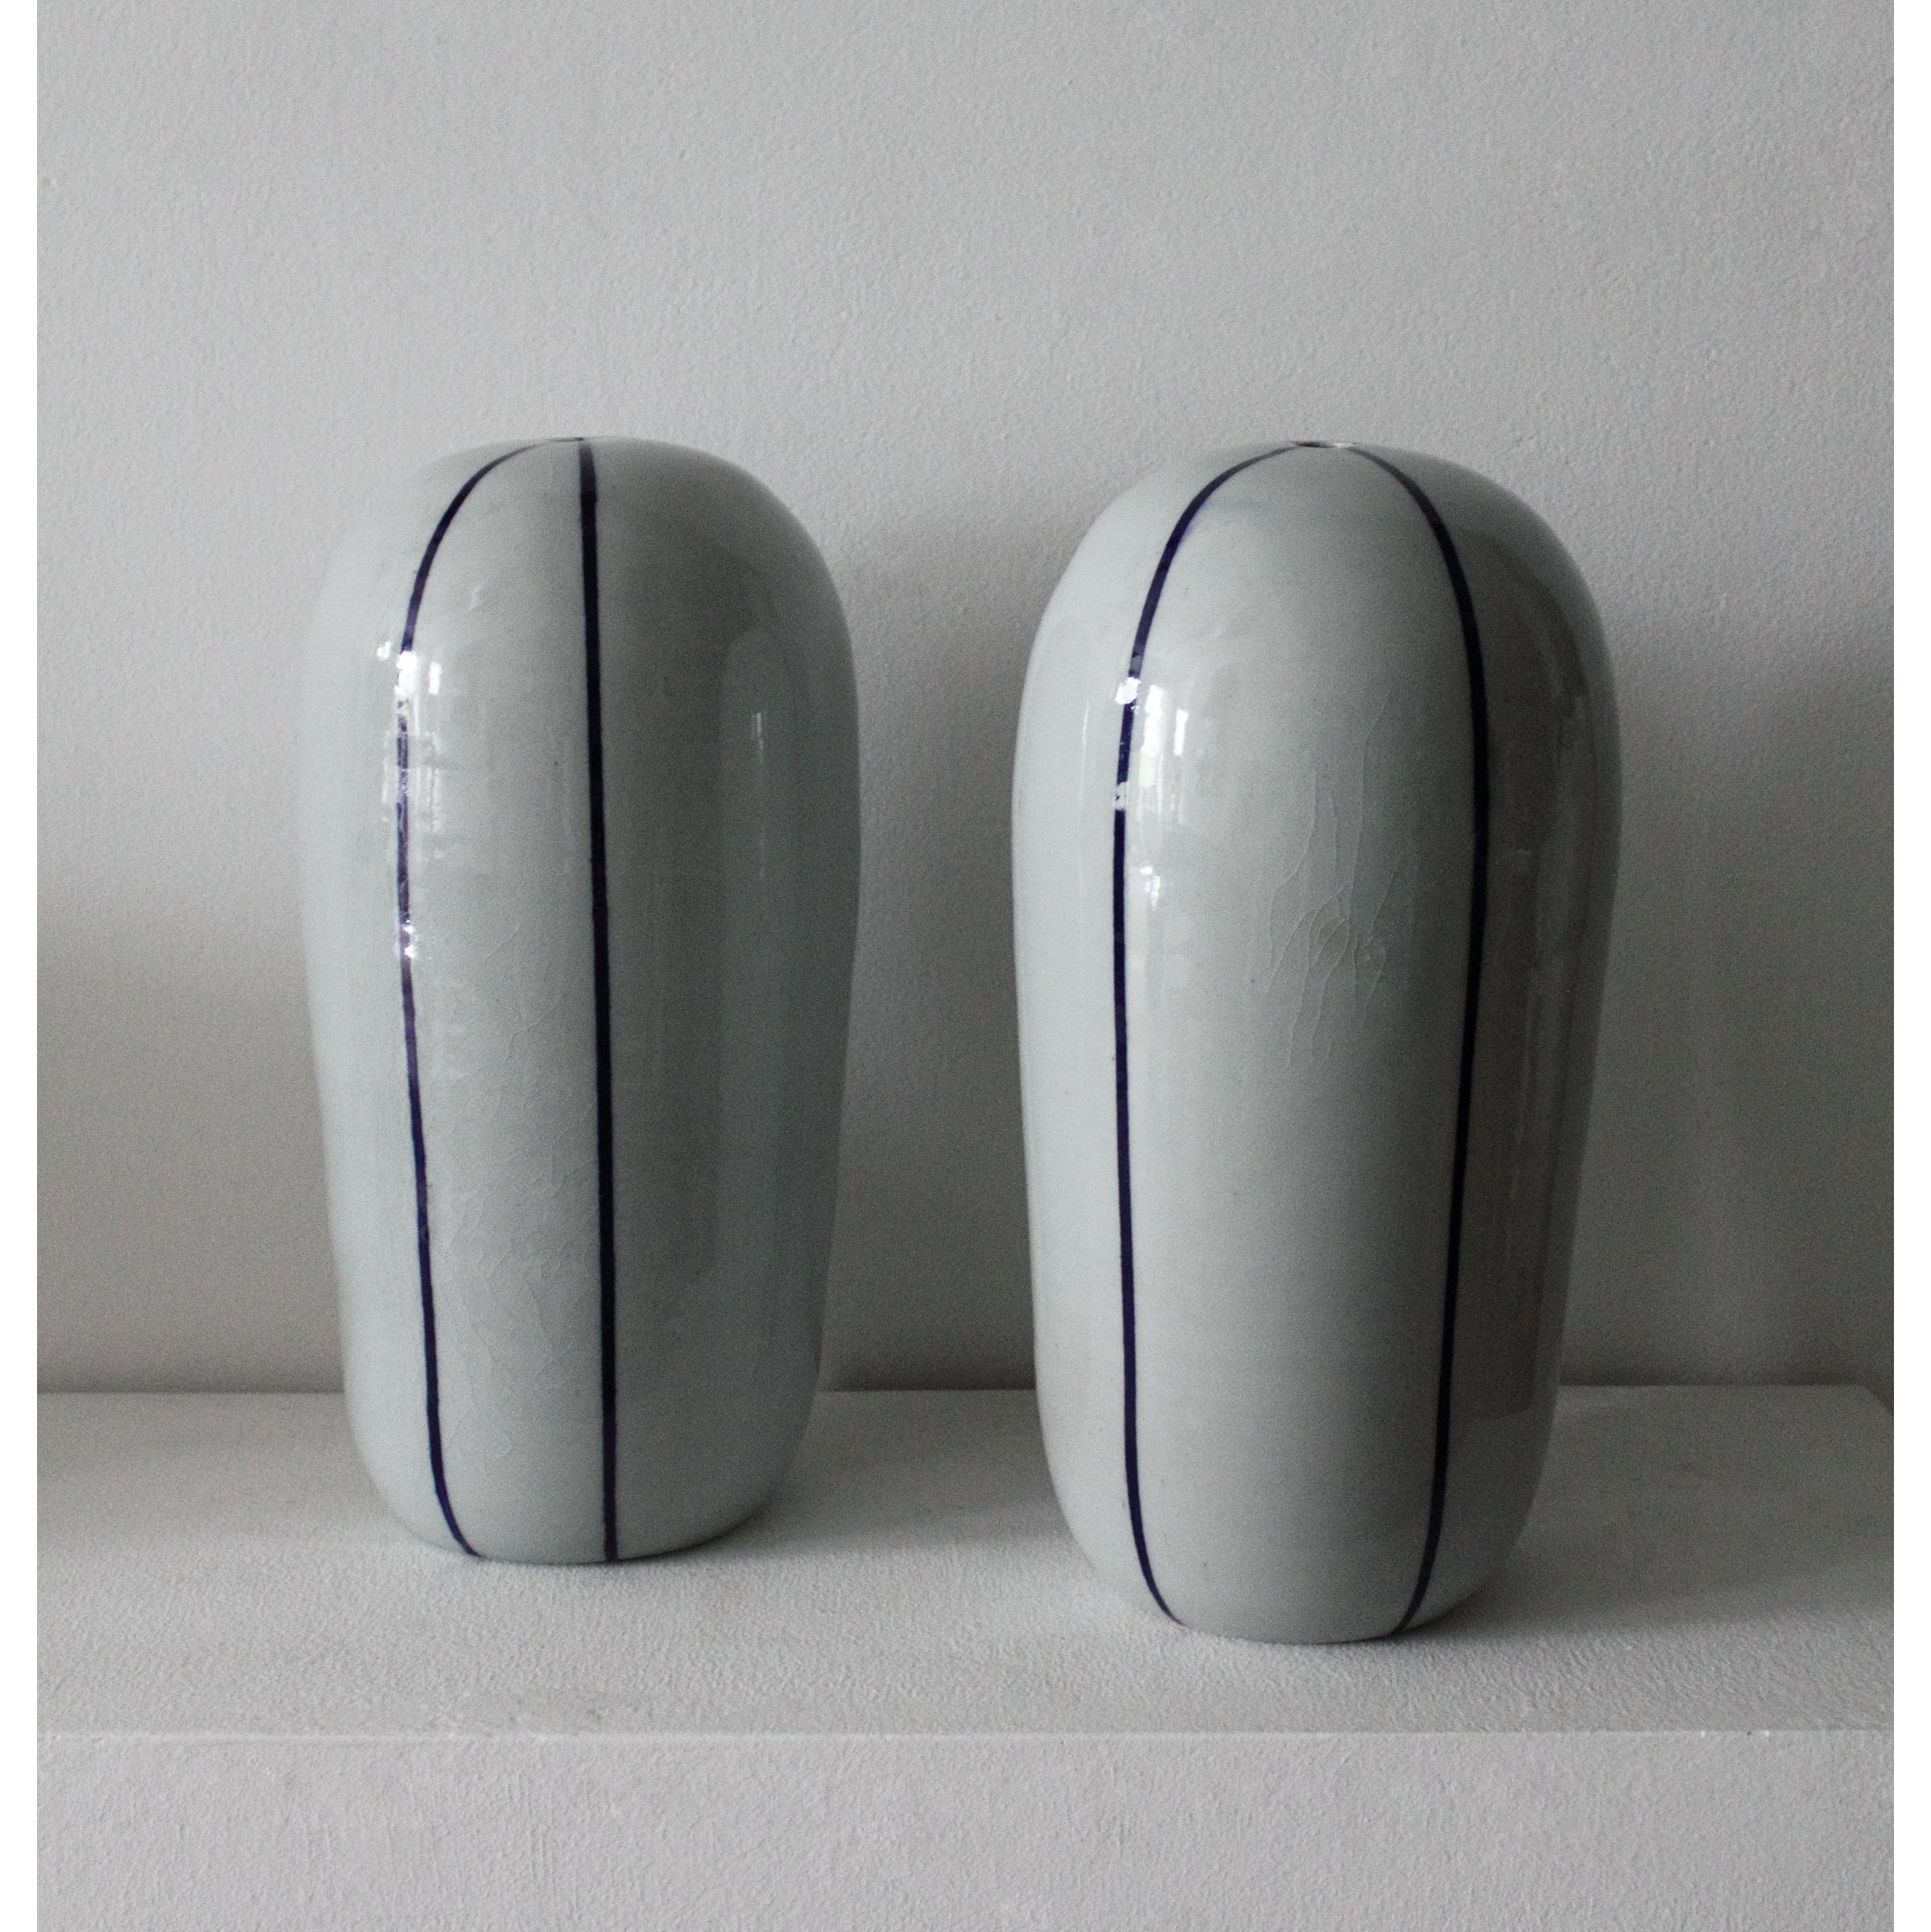 Striped Vessel/Lamp Base (Pair)